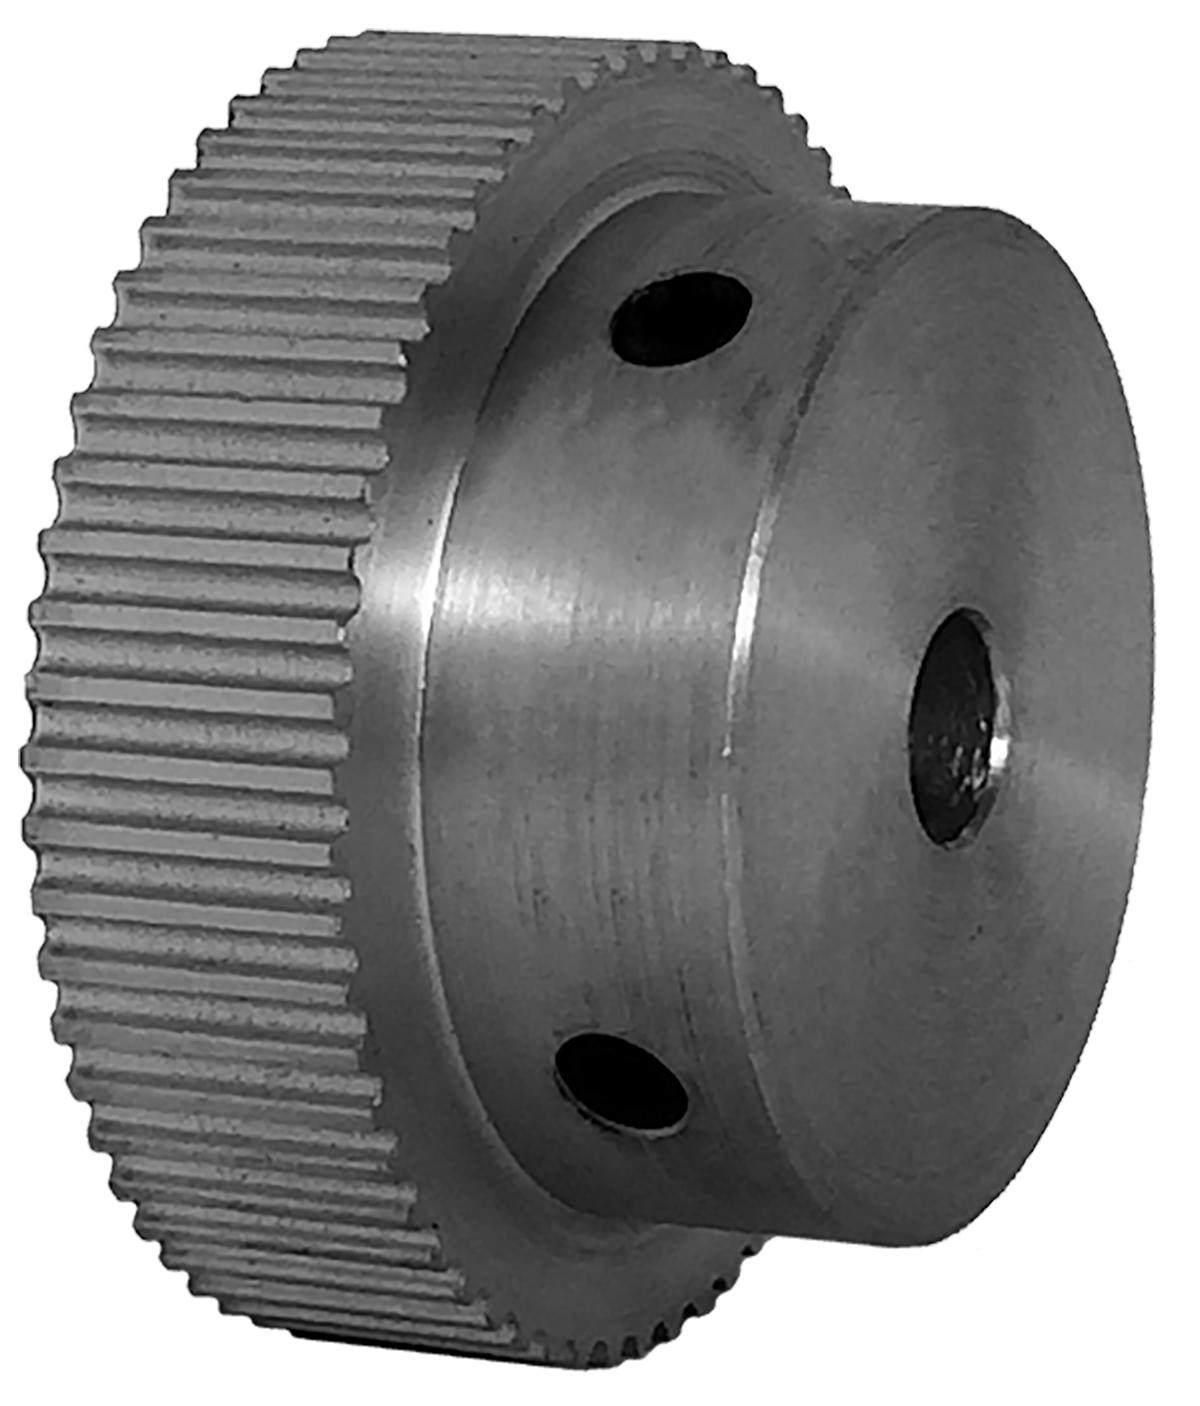 60-2P06-6A3 - Aluminum Powerhouse® Pulleys